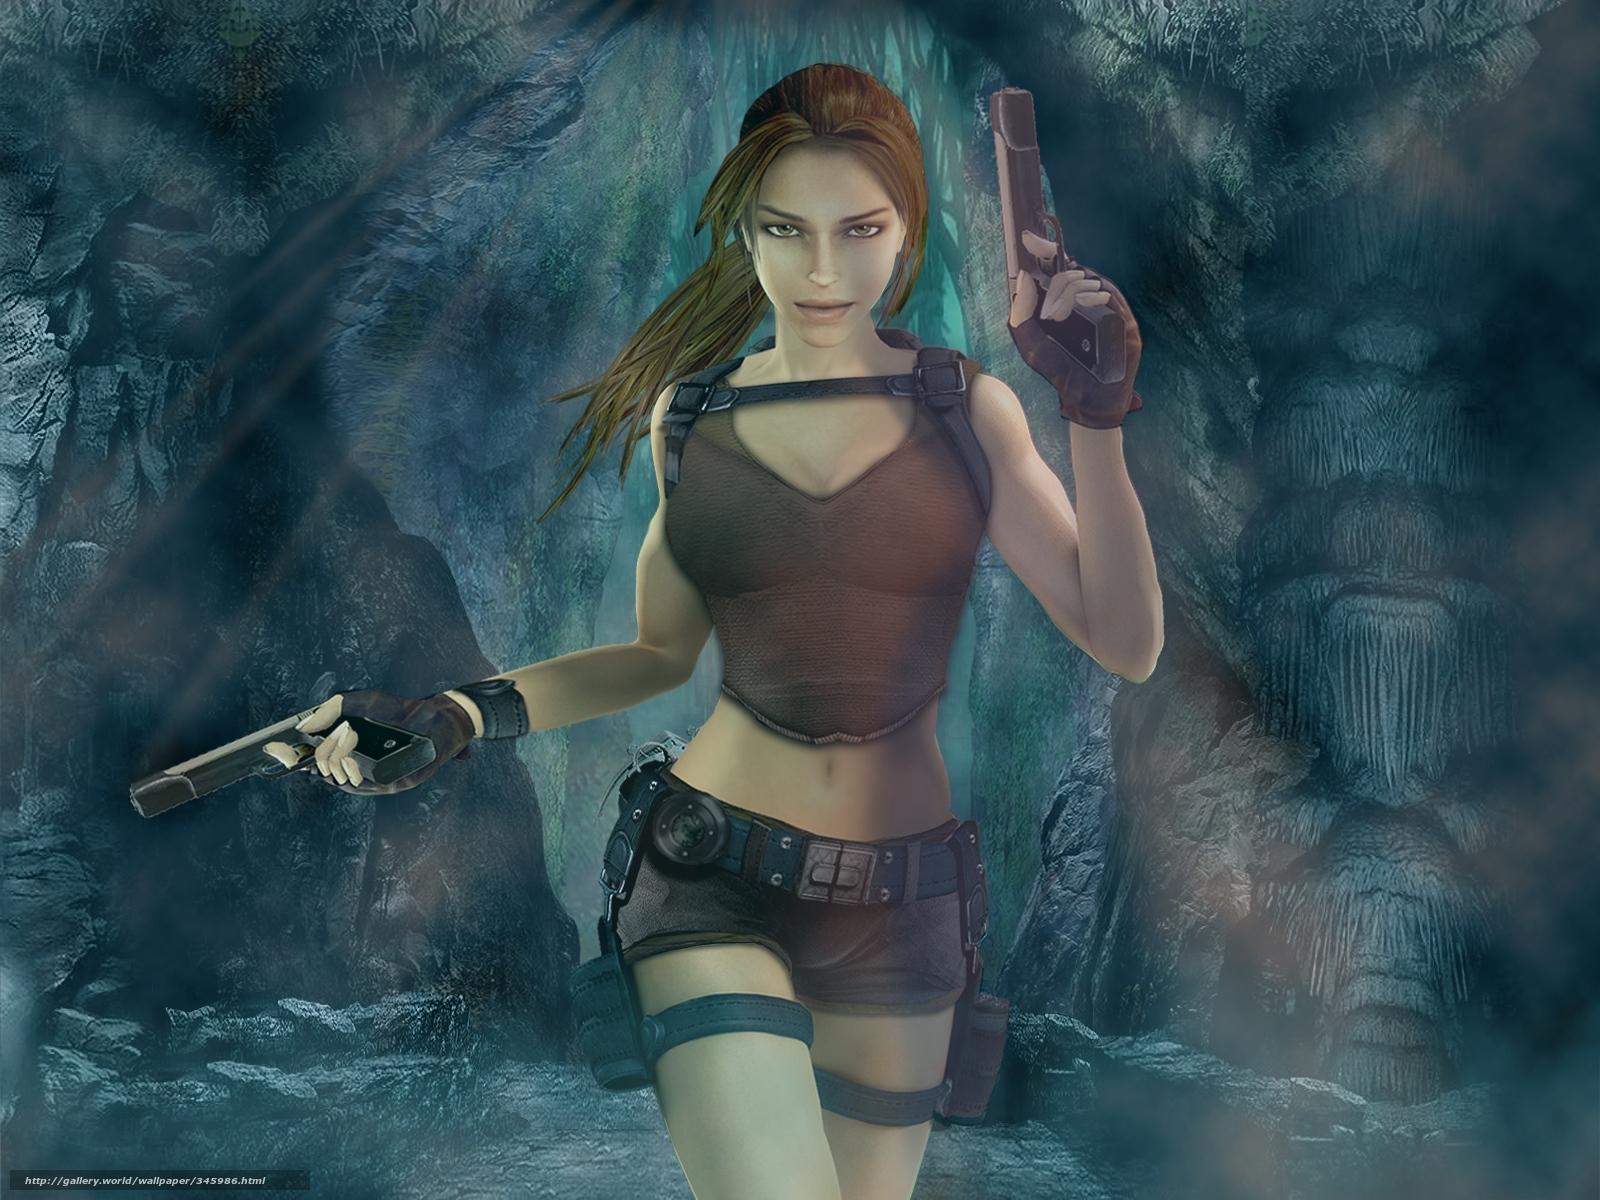 Lara croft cartoon anal sex pixs nude image